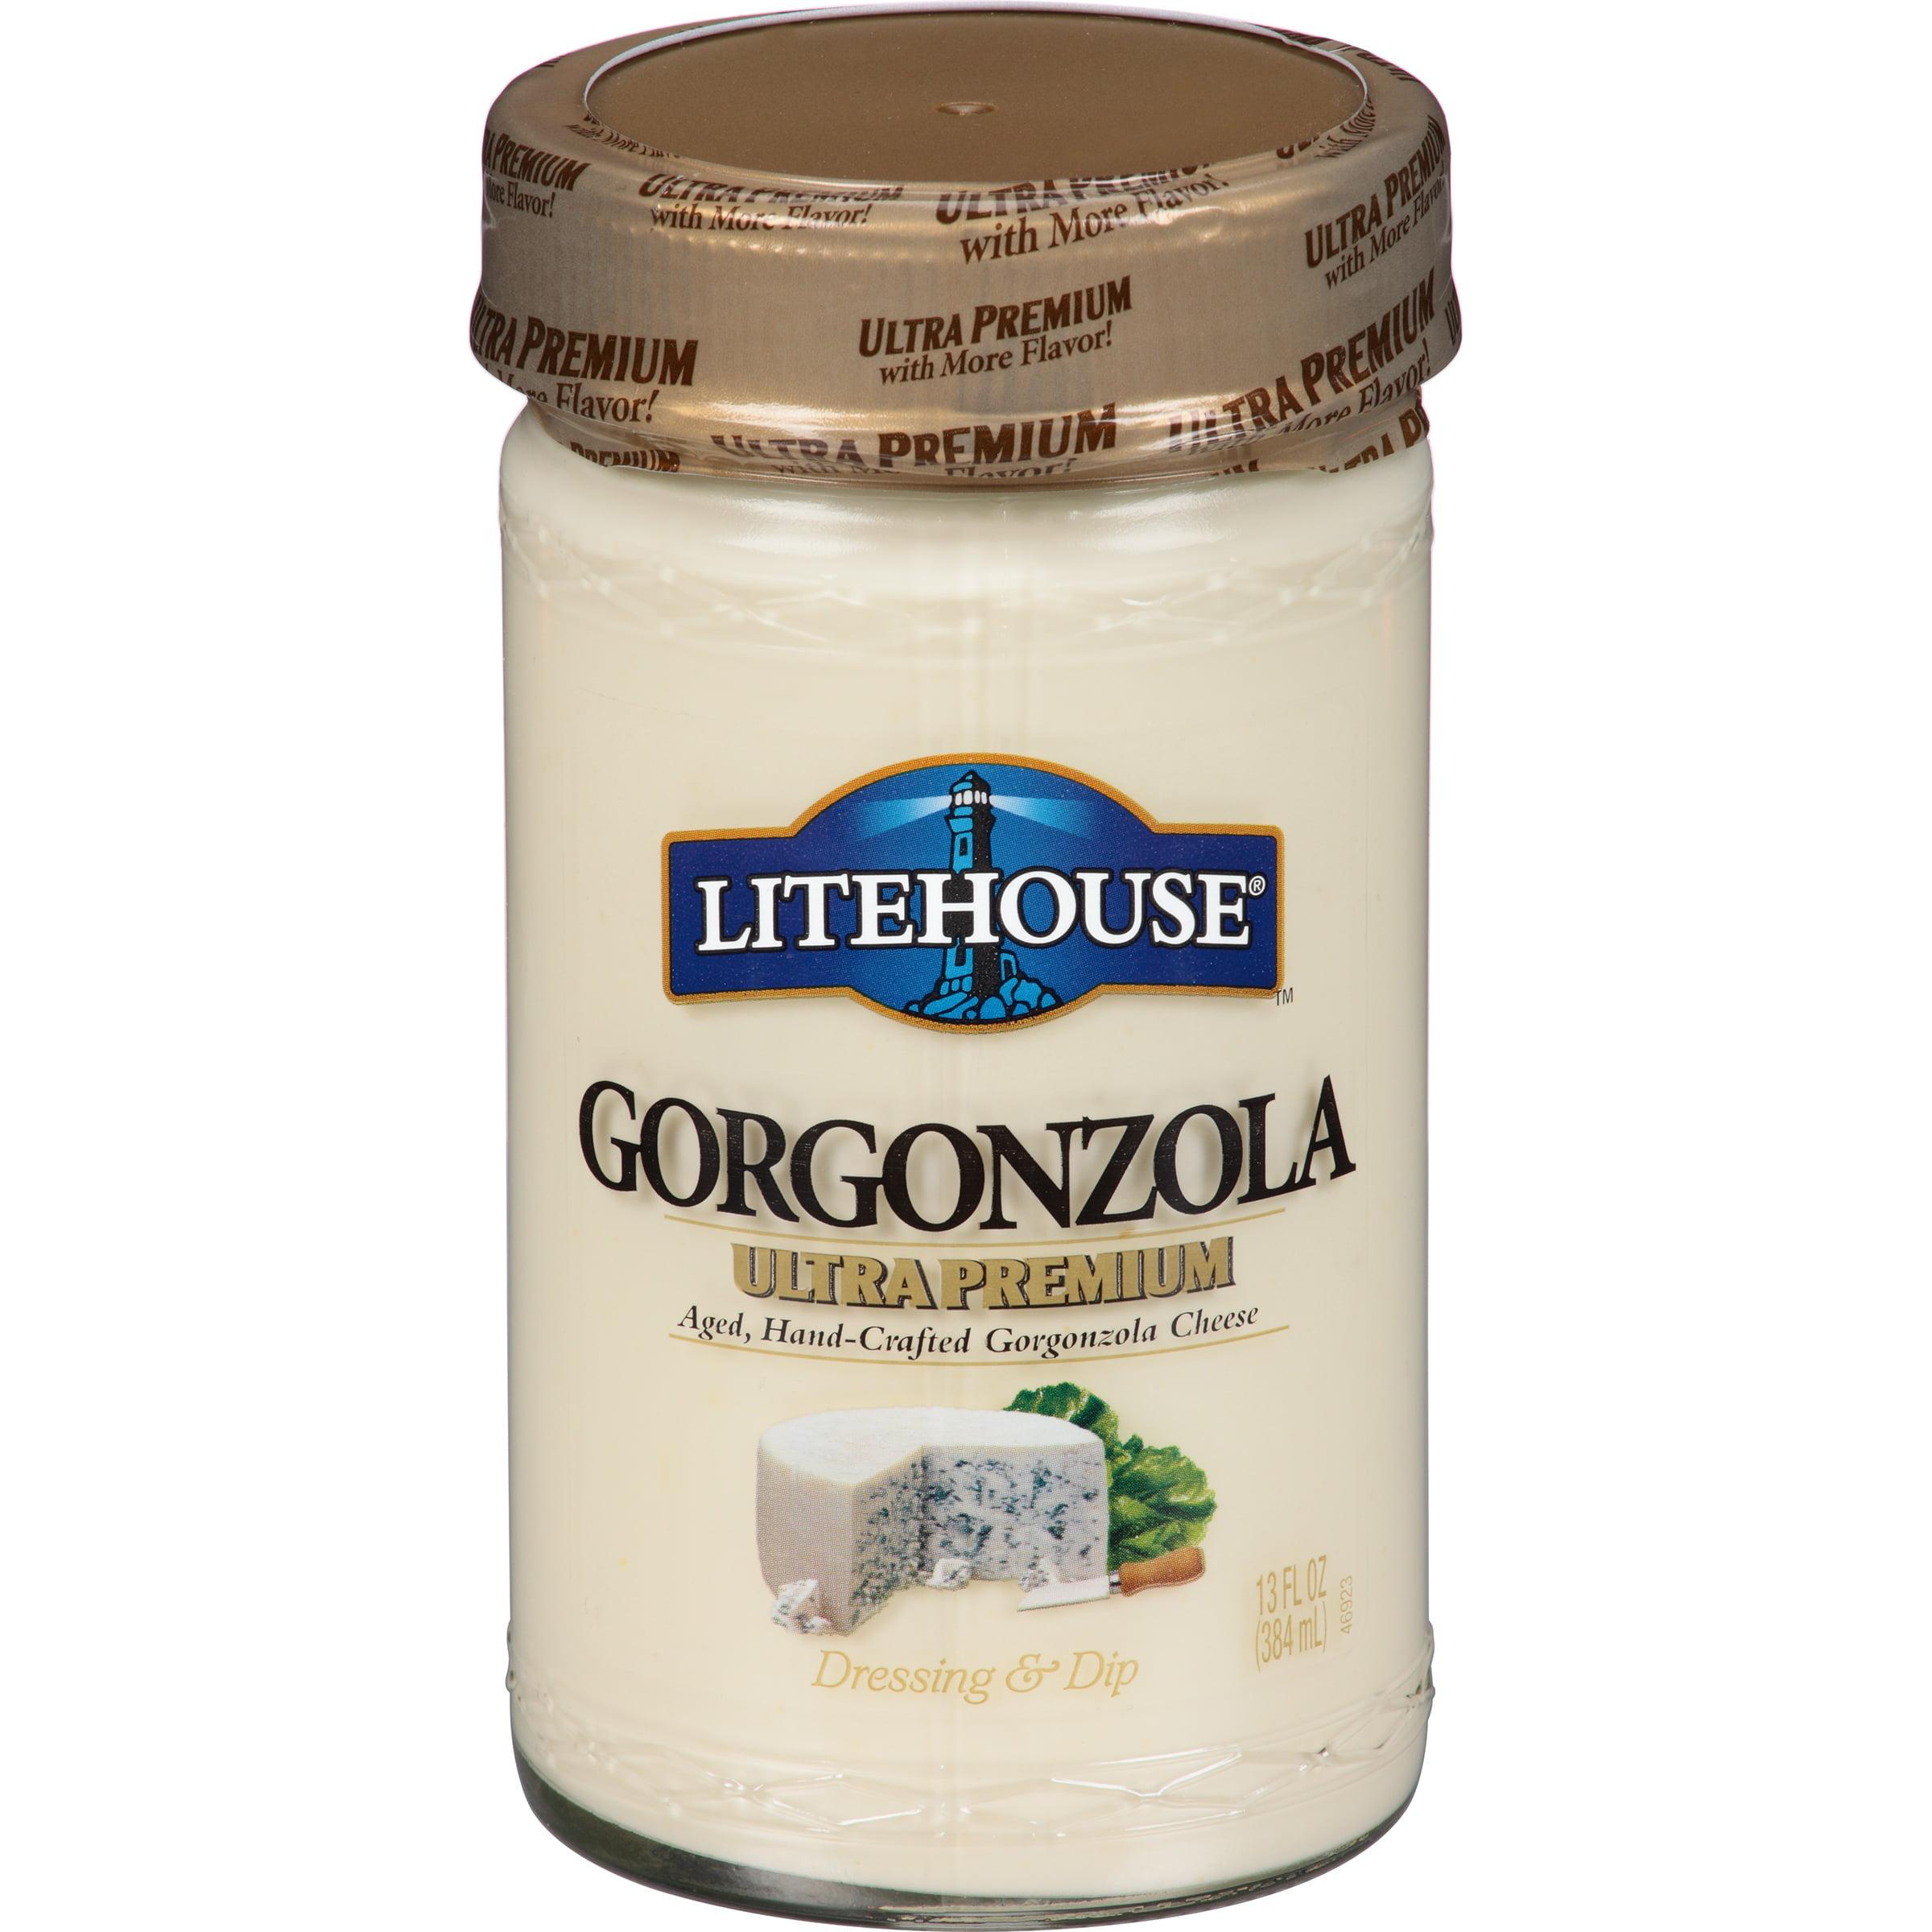 Litehouse® Gorgonzola Dressing & Dip 13 fl. oz. Jar